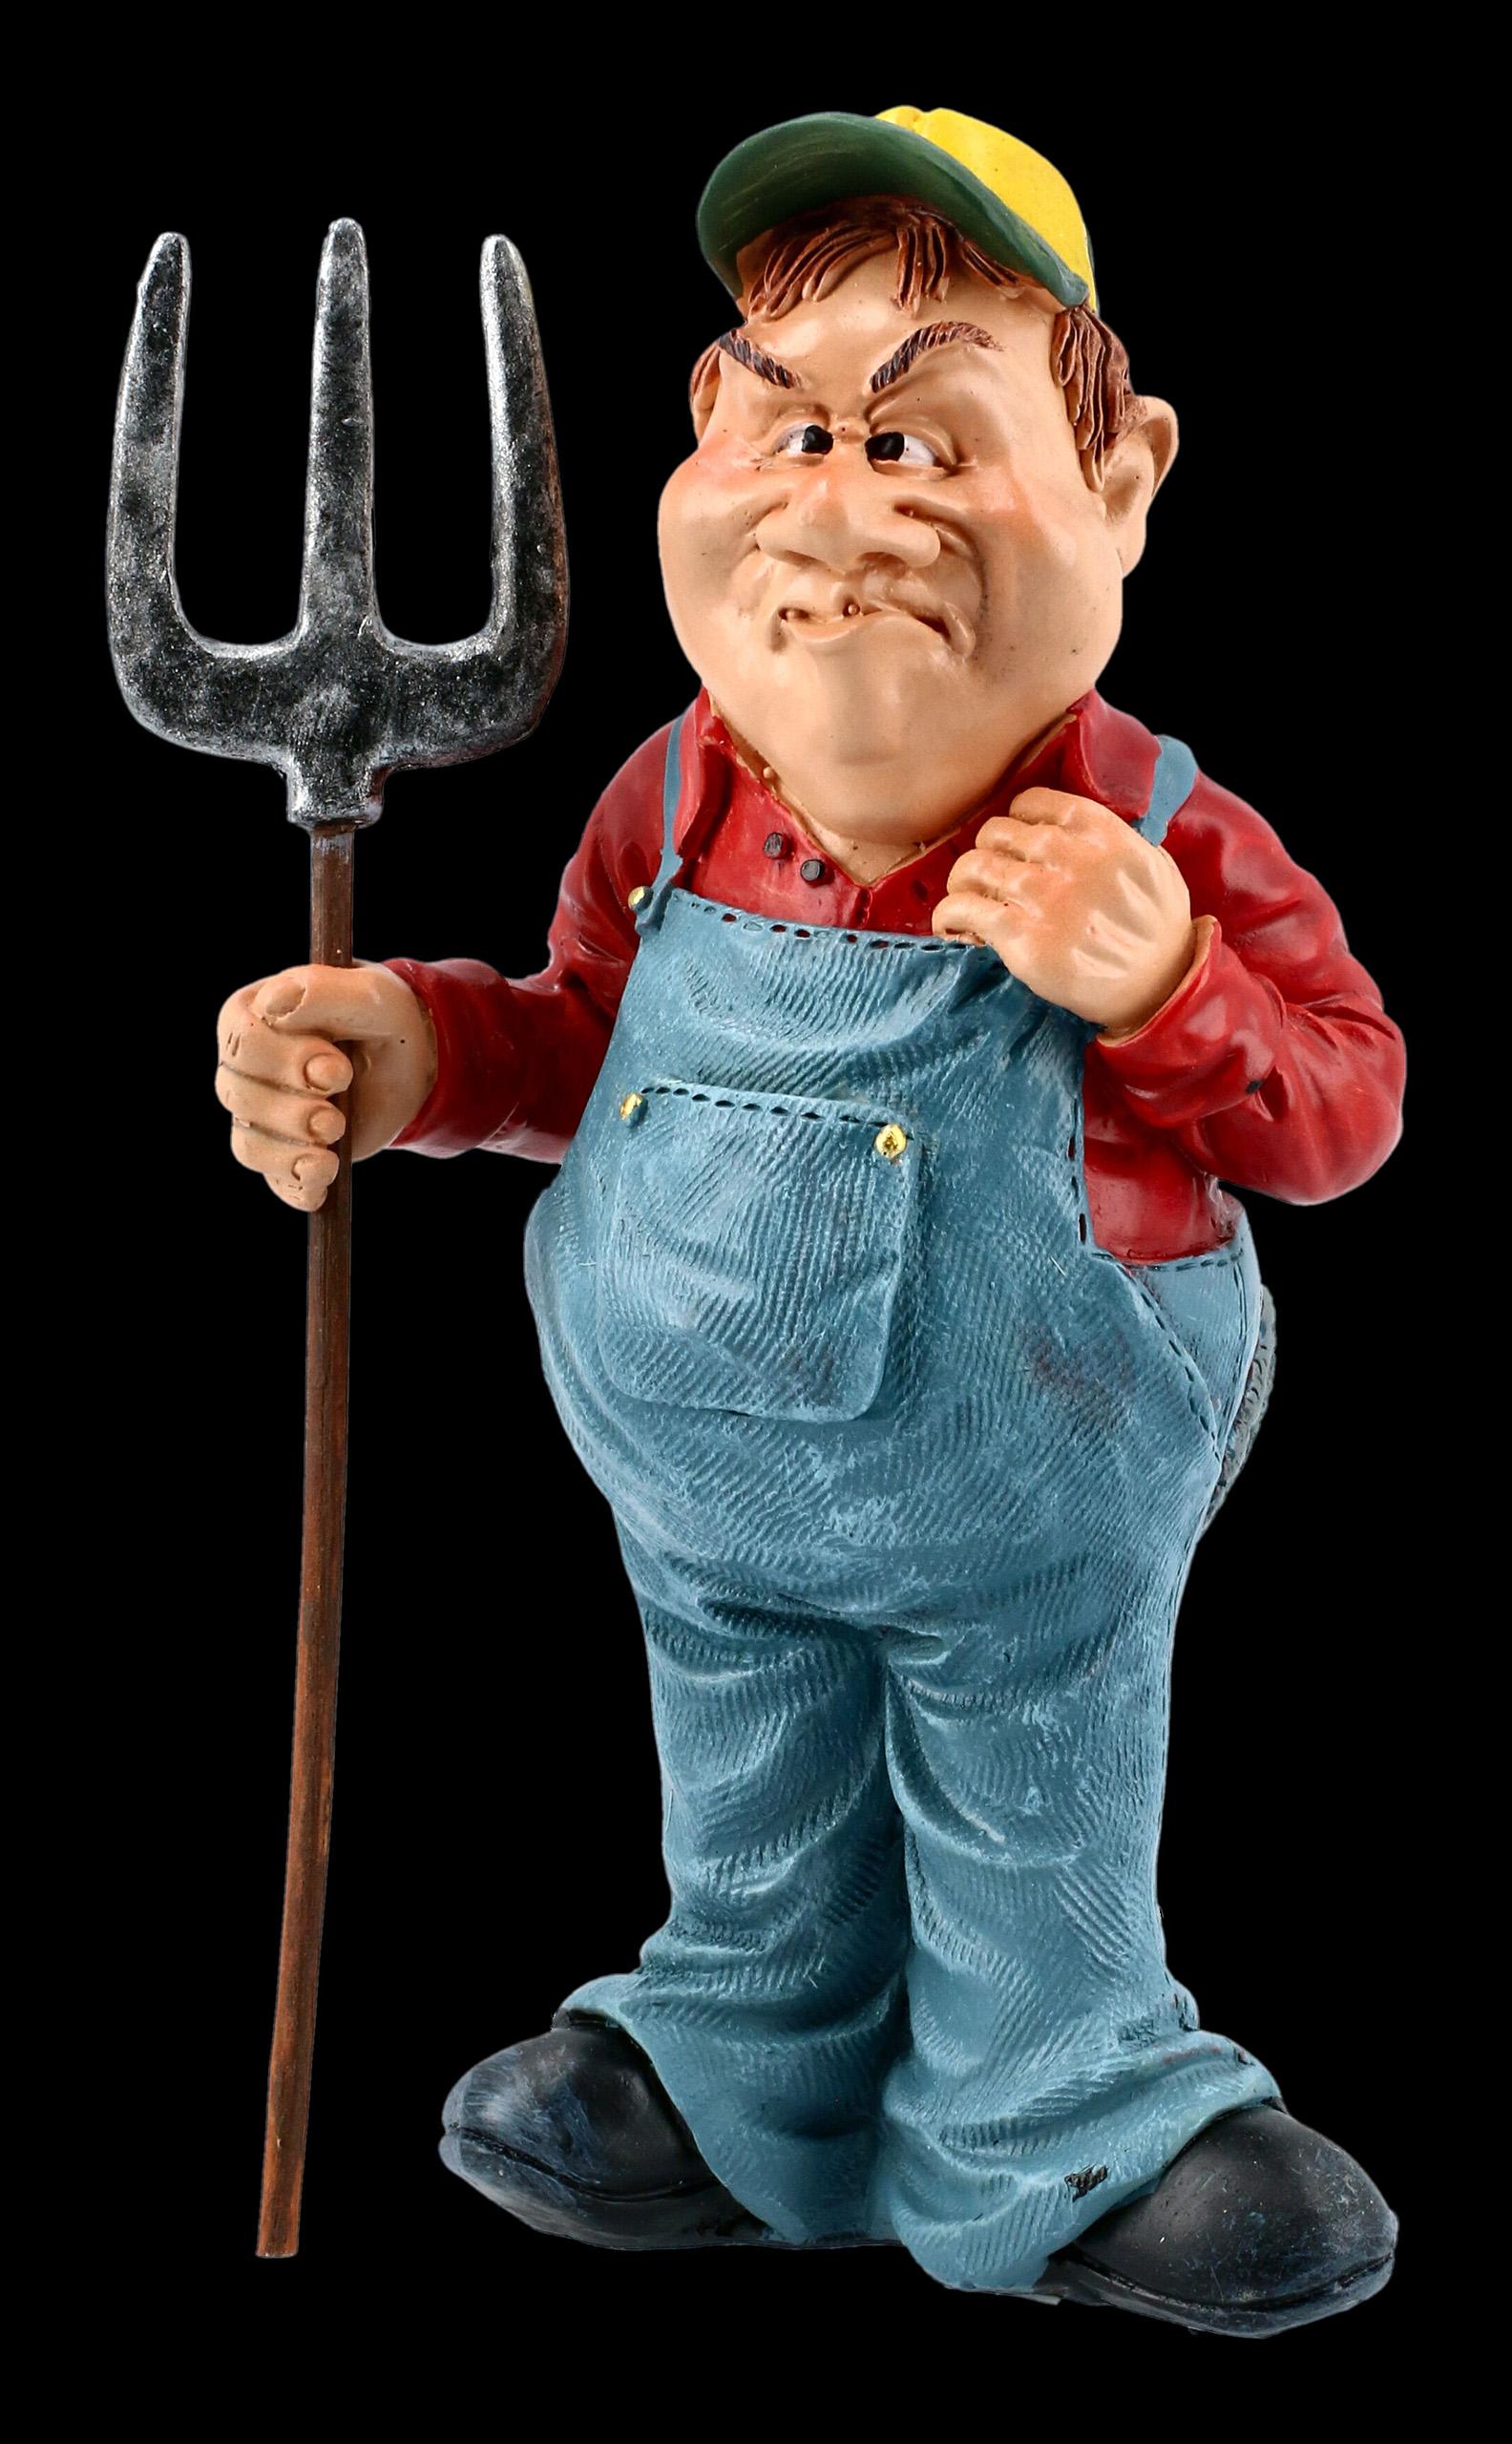 Bauer mit Mistgabel Farmer 15 cm Beruf Funny Figur Kollektion Neu